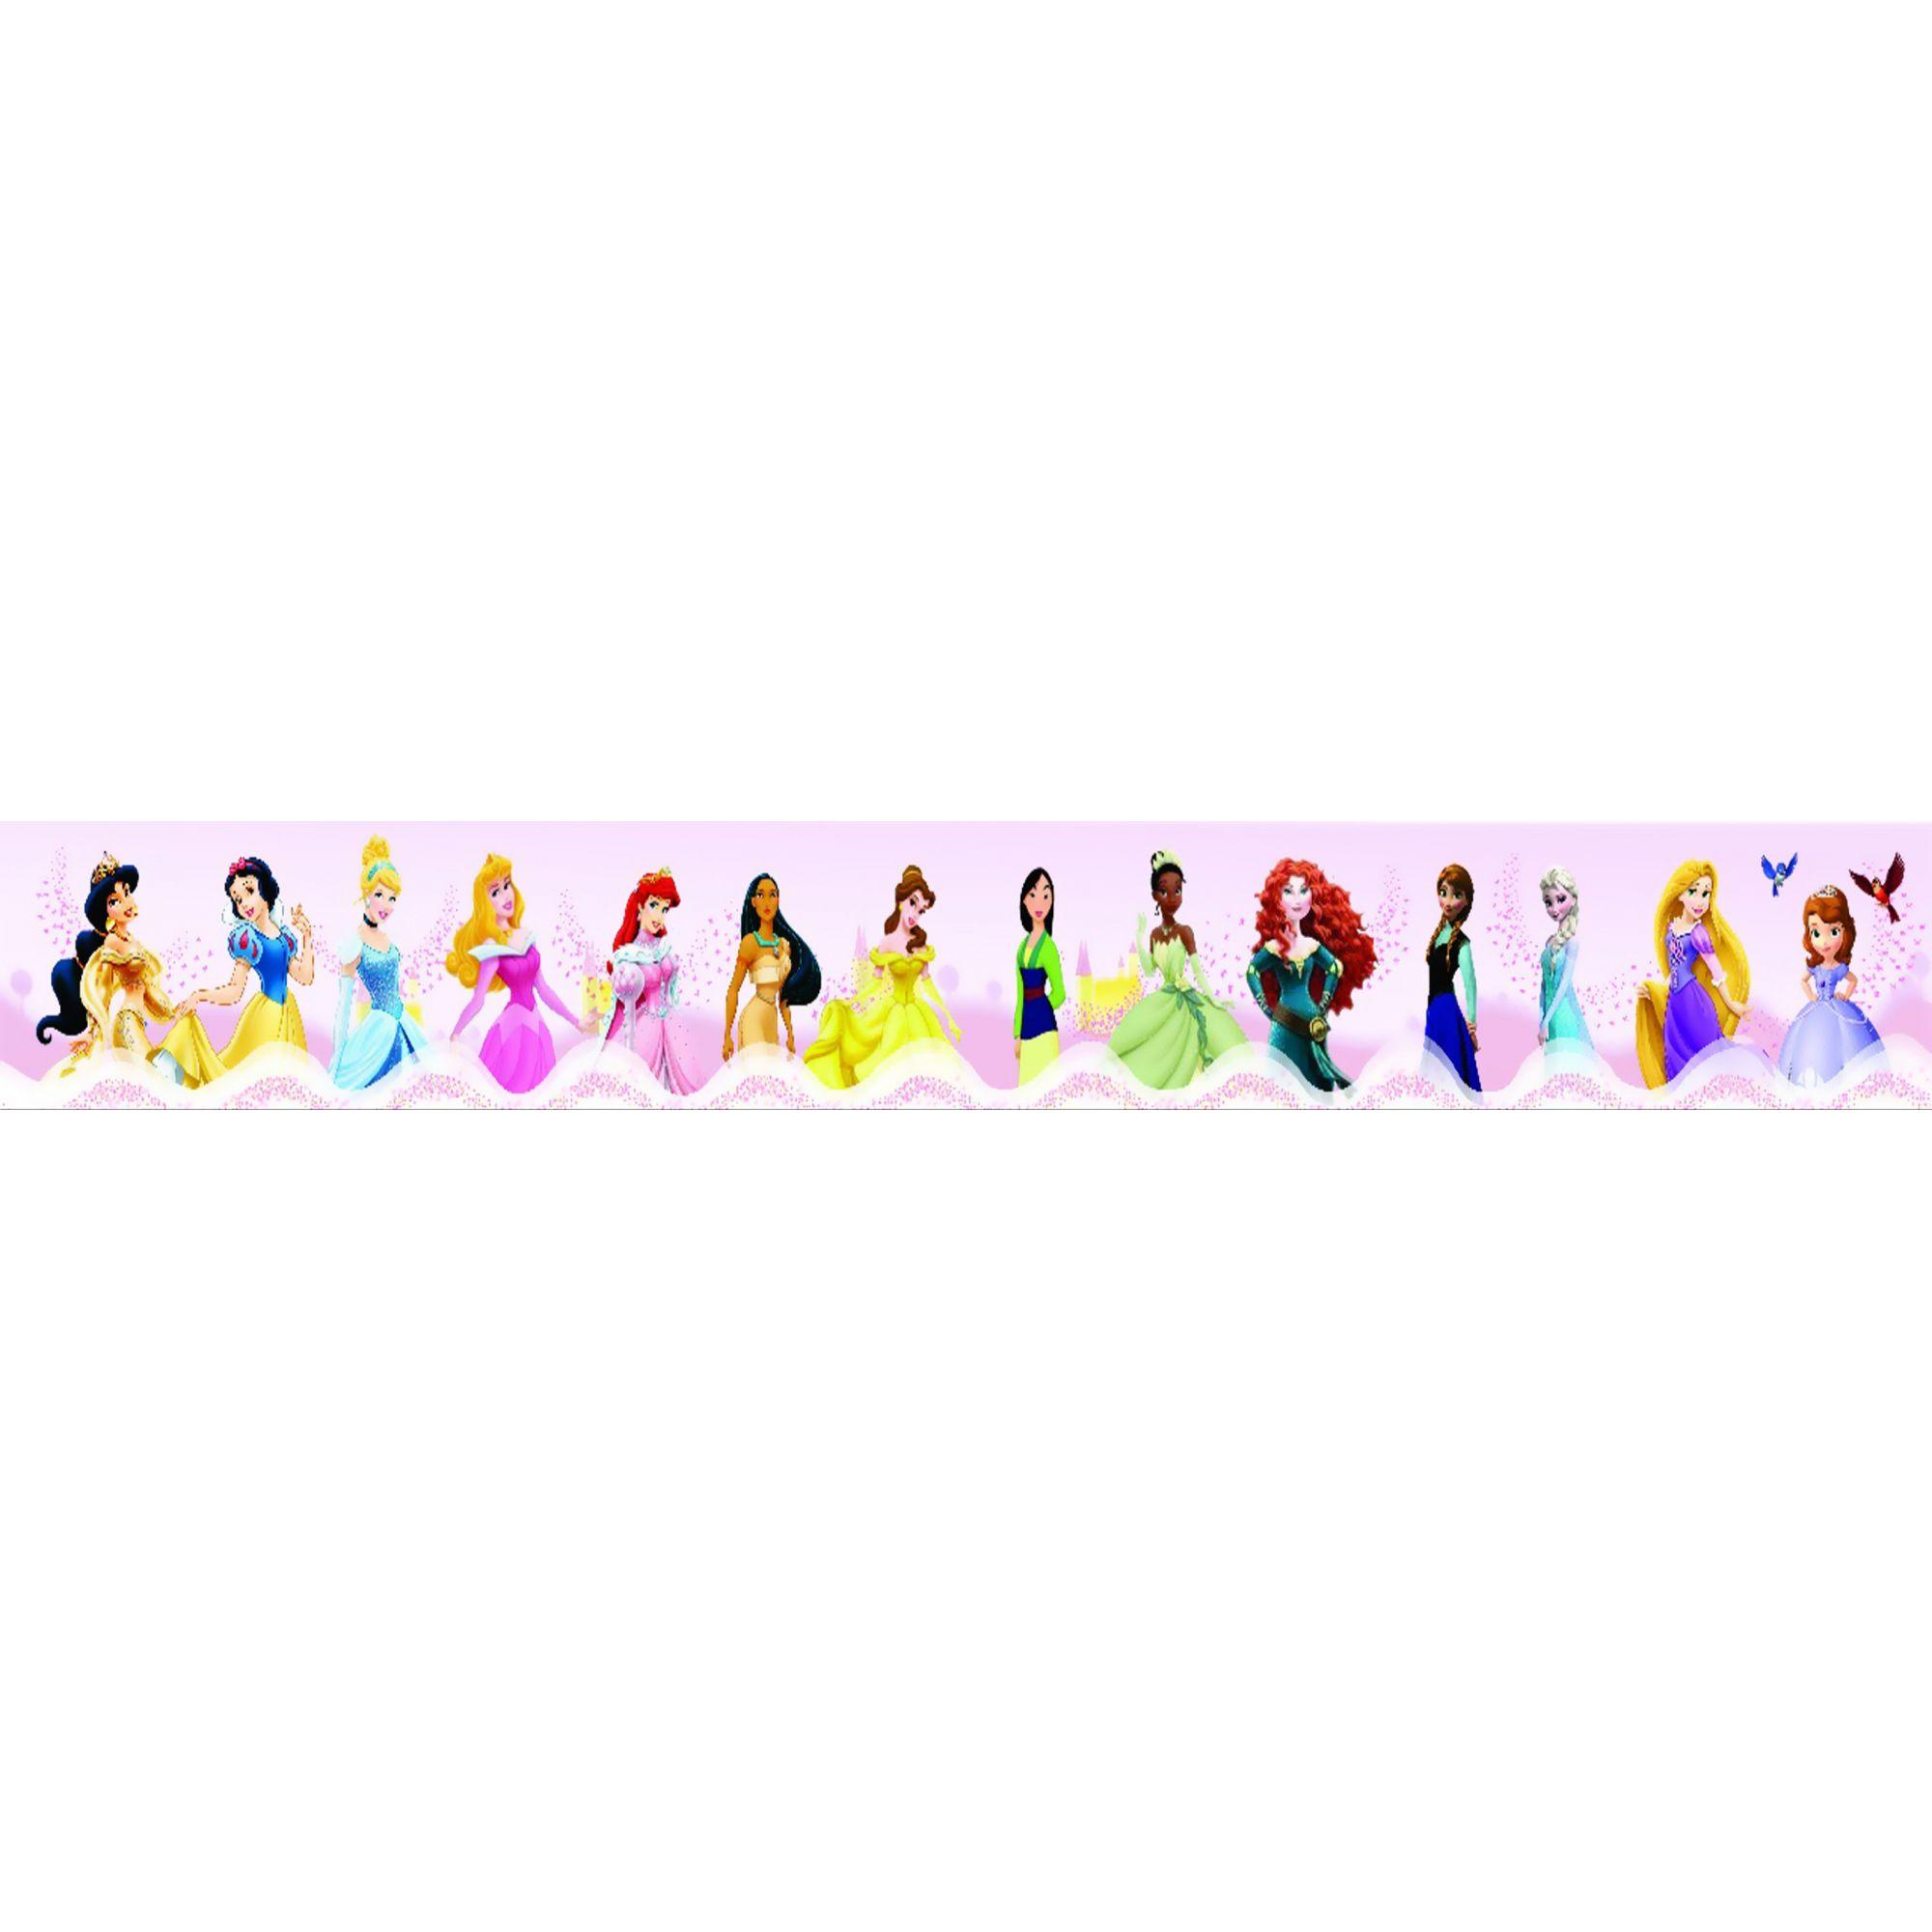 Faixa Decorativa Adesiva Princesas frozem  - Final Decor